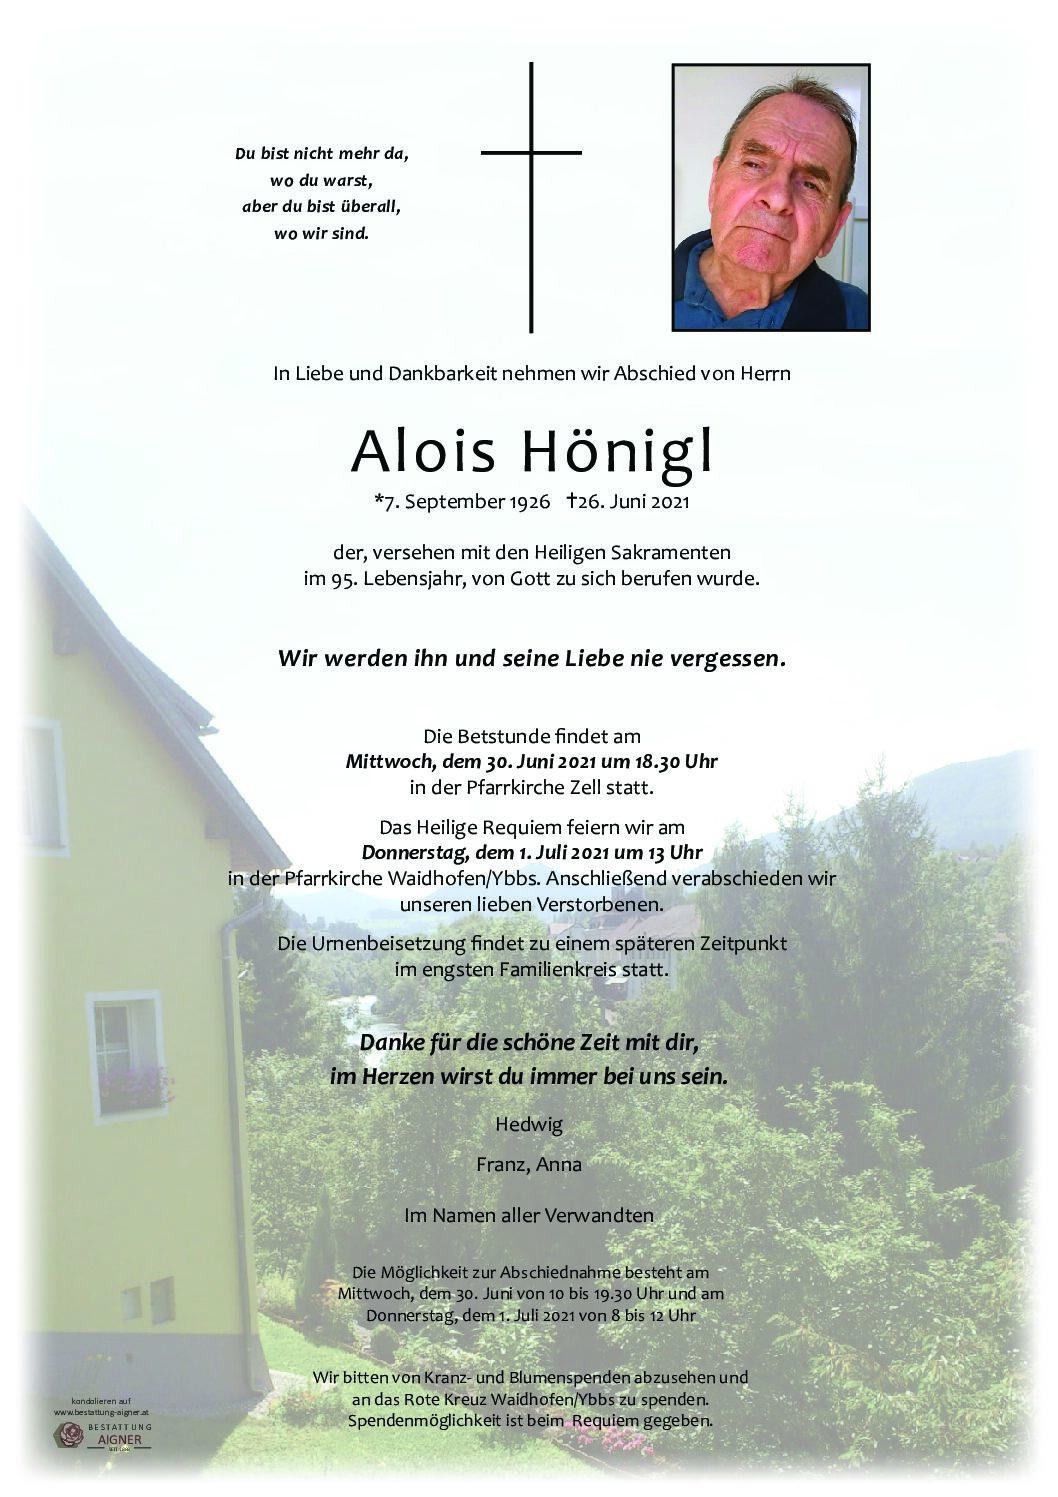 Alois Hönigl